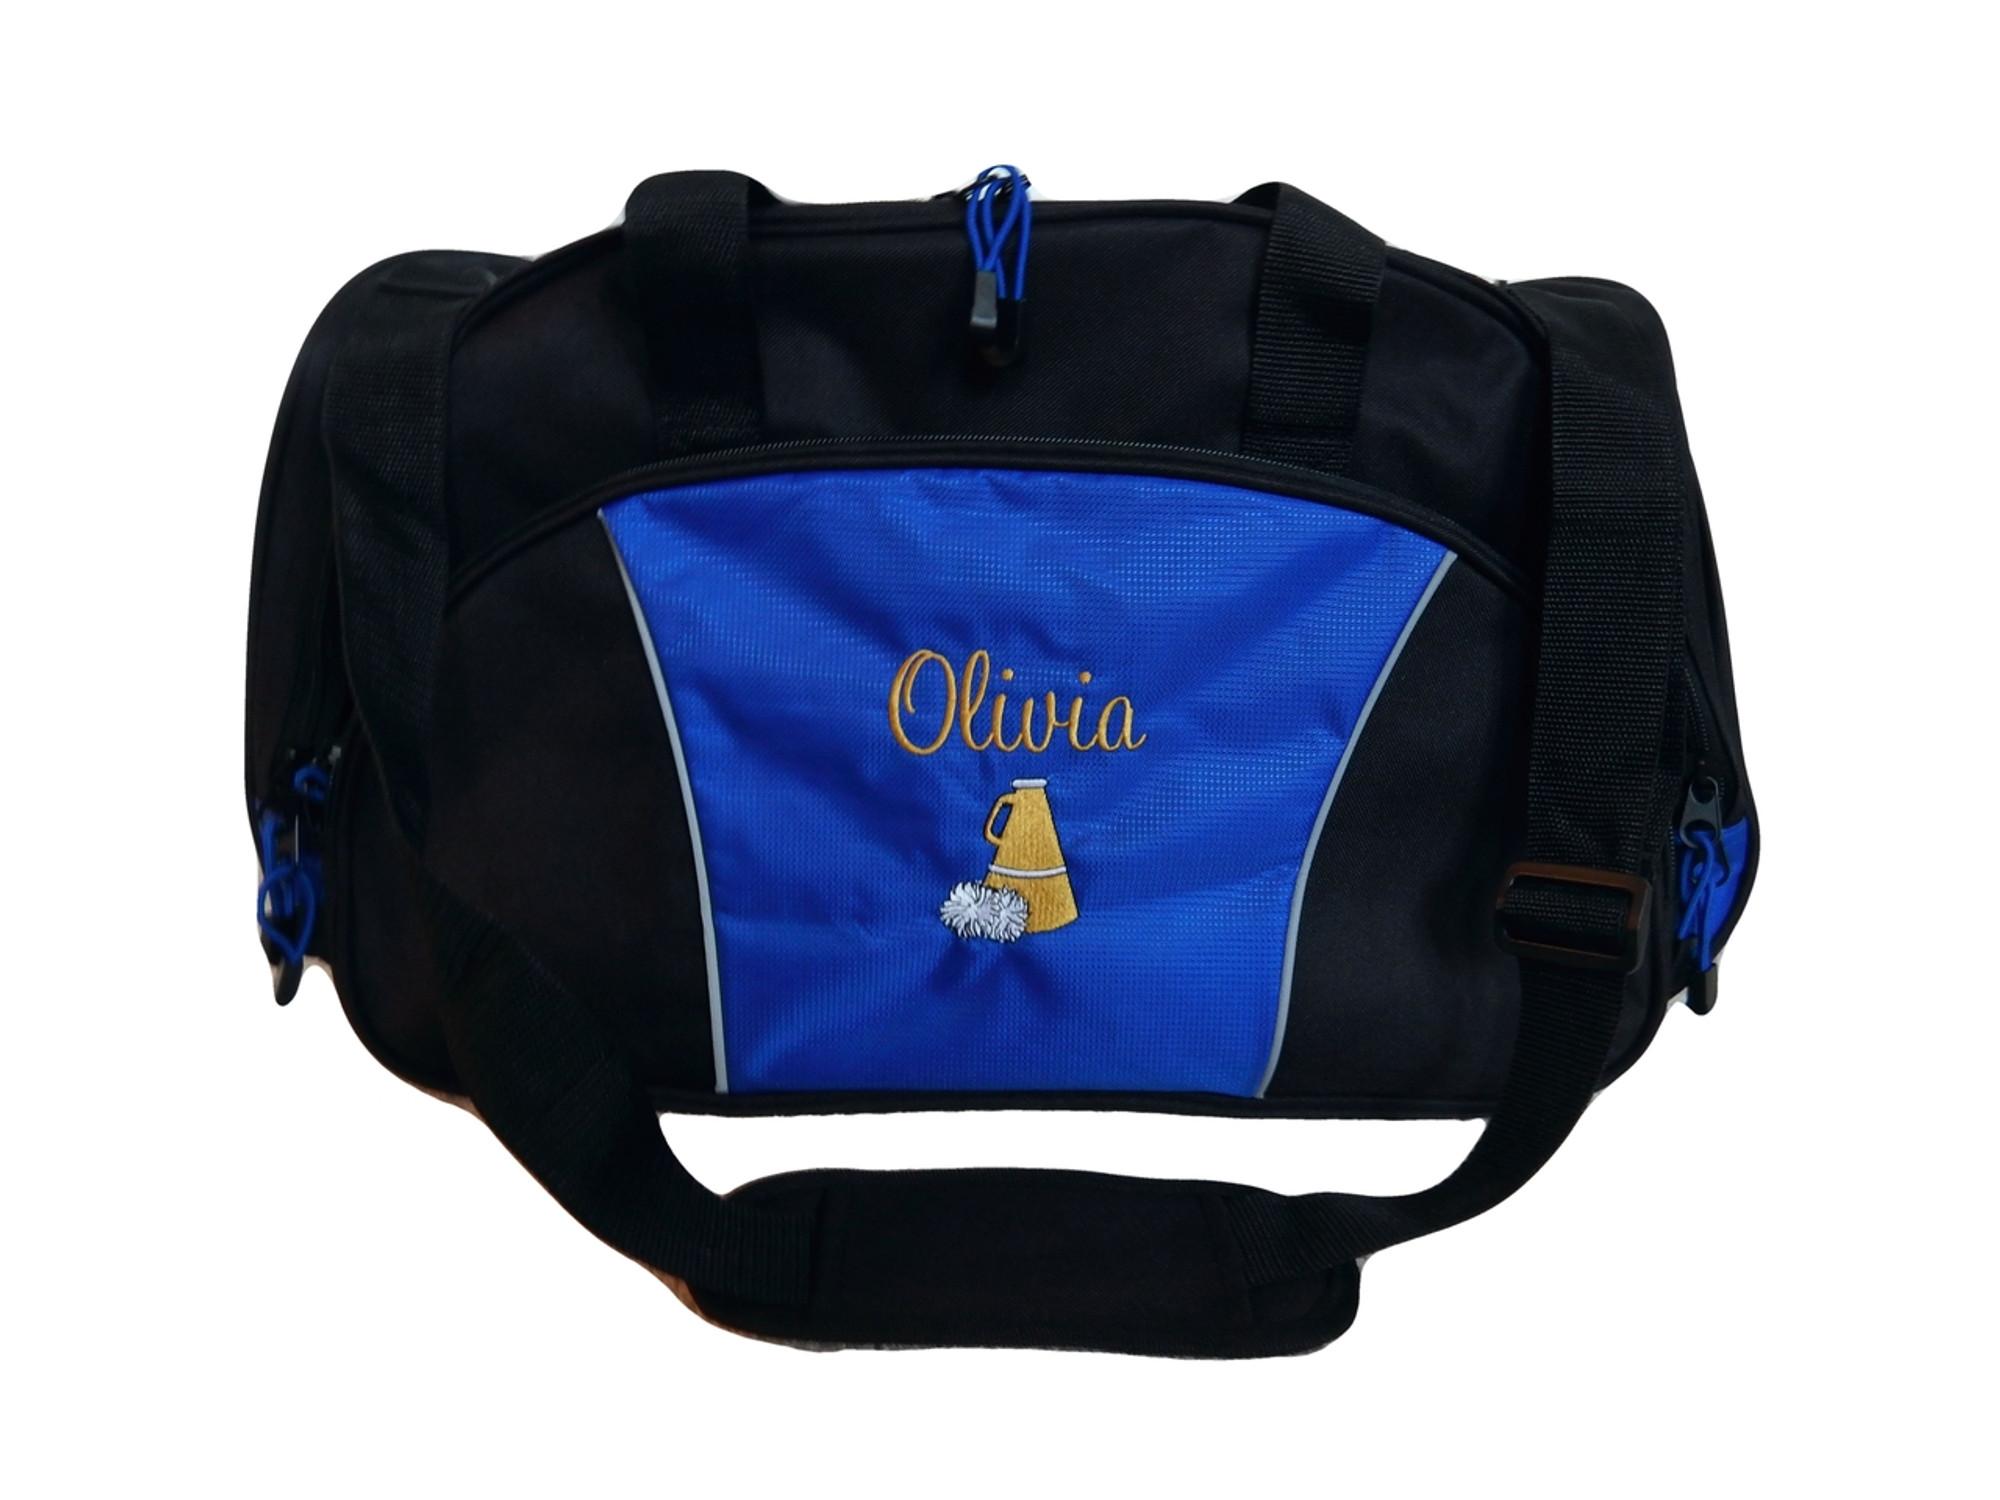 Cheer Bullhorn Cheerleading Poms Dance Personalized Embroidered Duffel f7dee56aa4de3